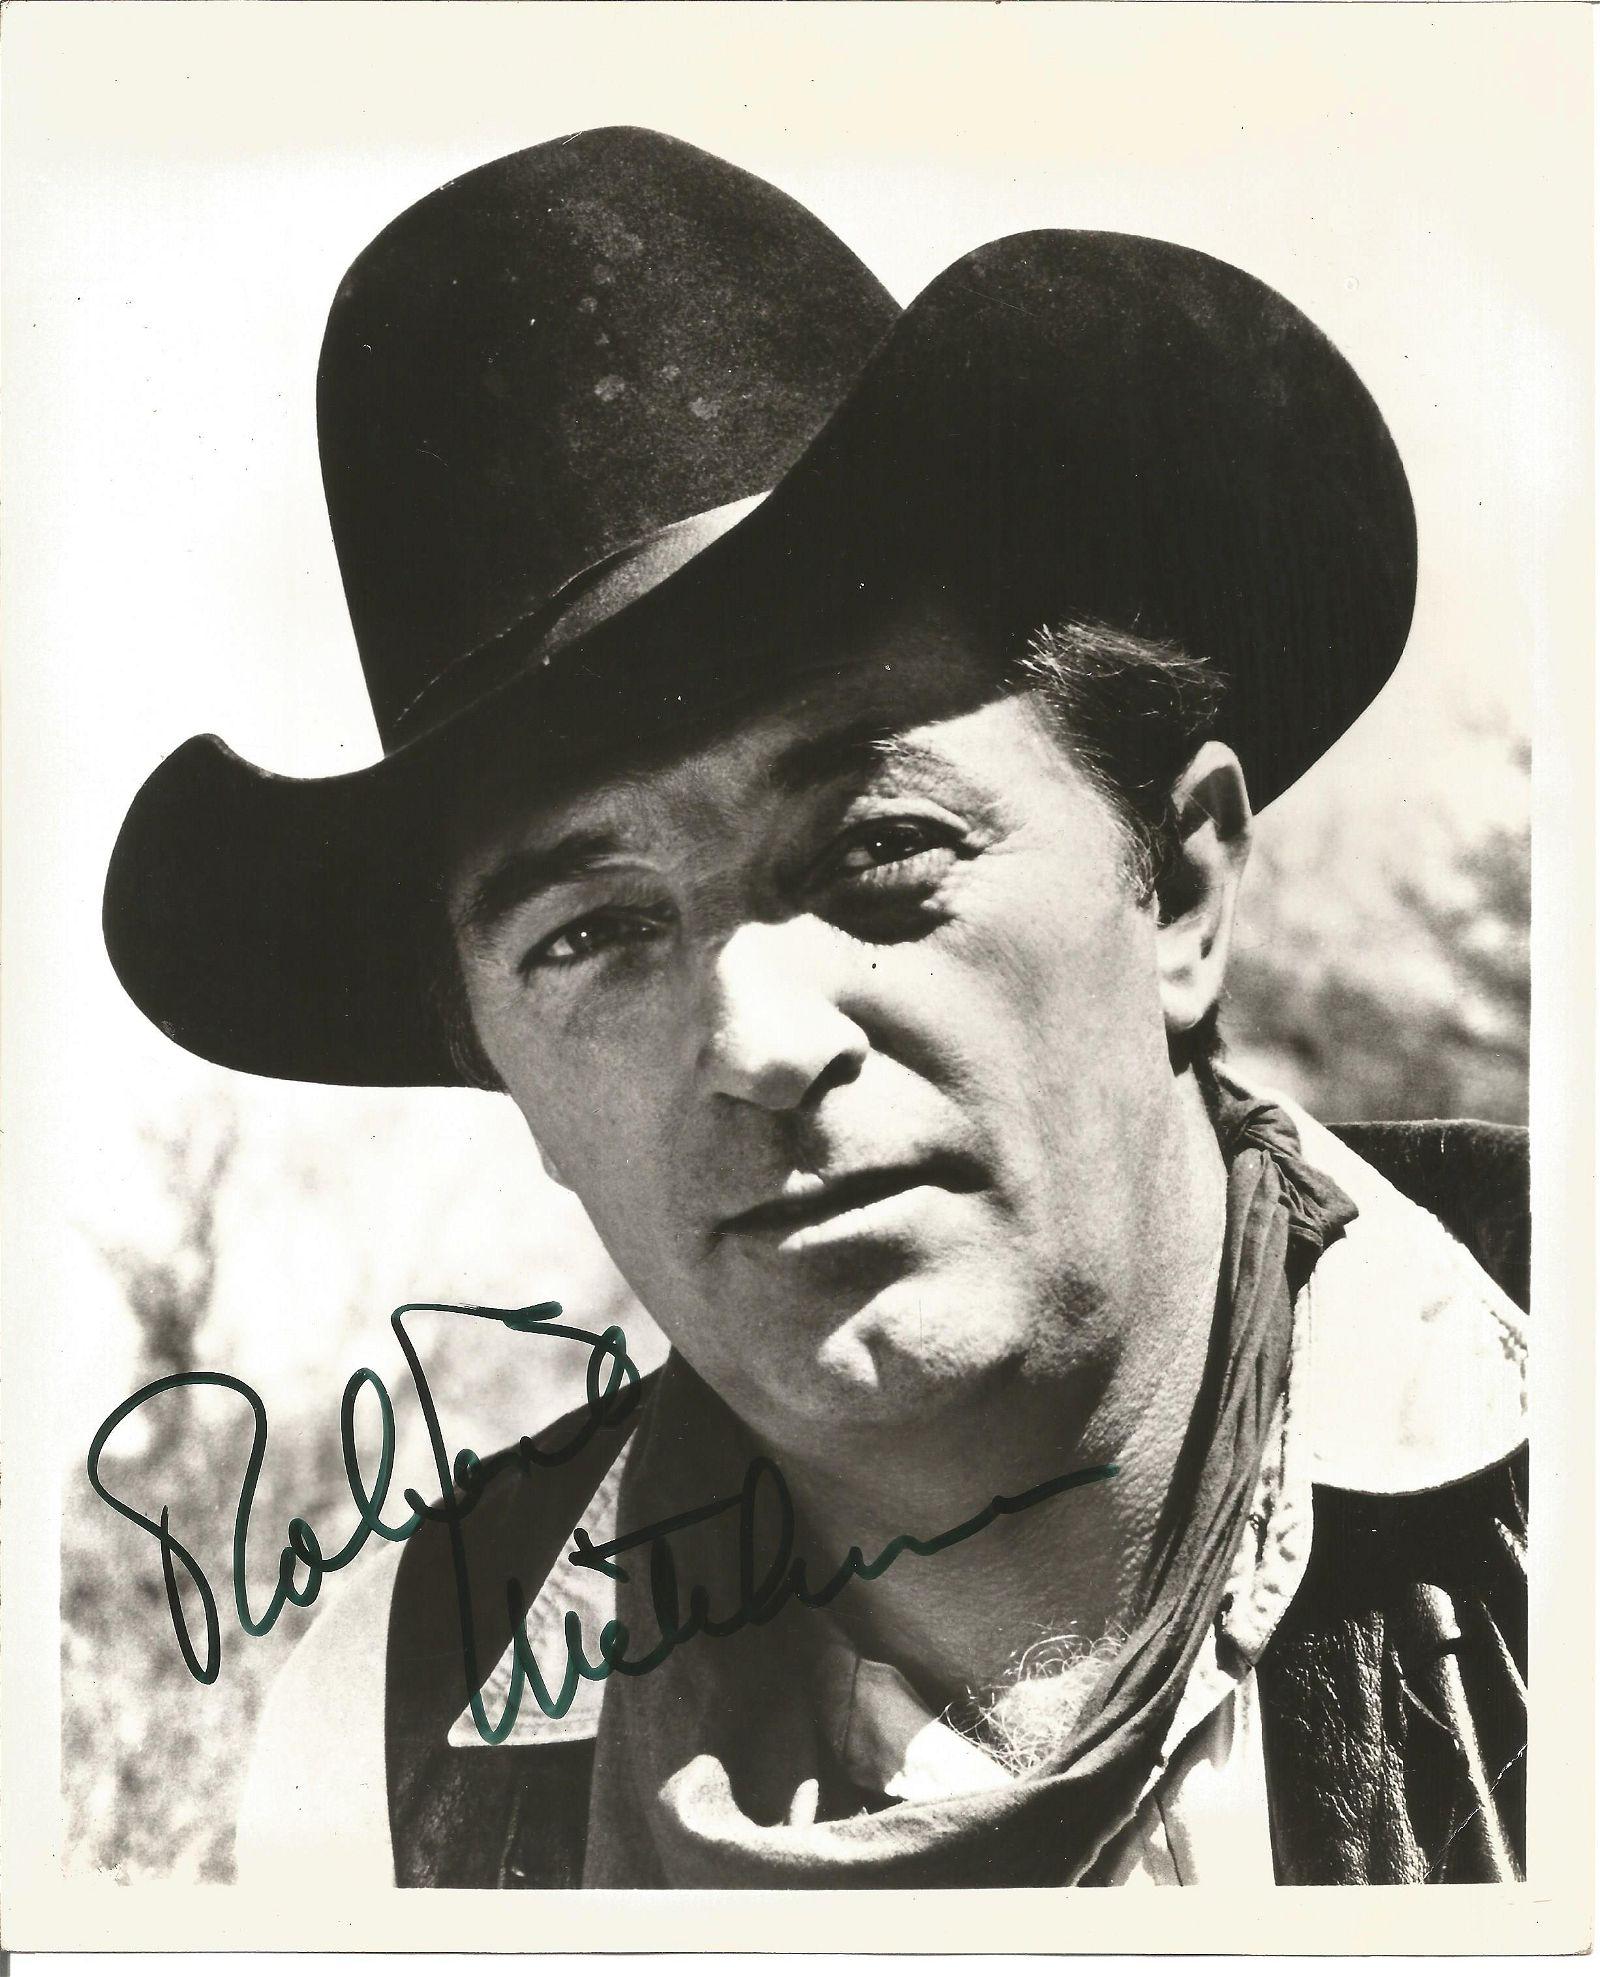 Robert Mitchum Signed 10 x 8 b/w photo. Condition 8/10.